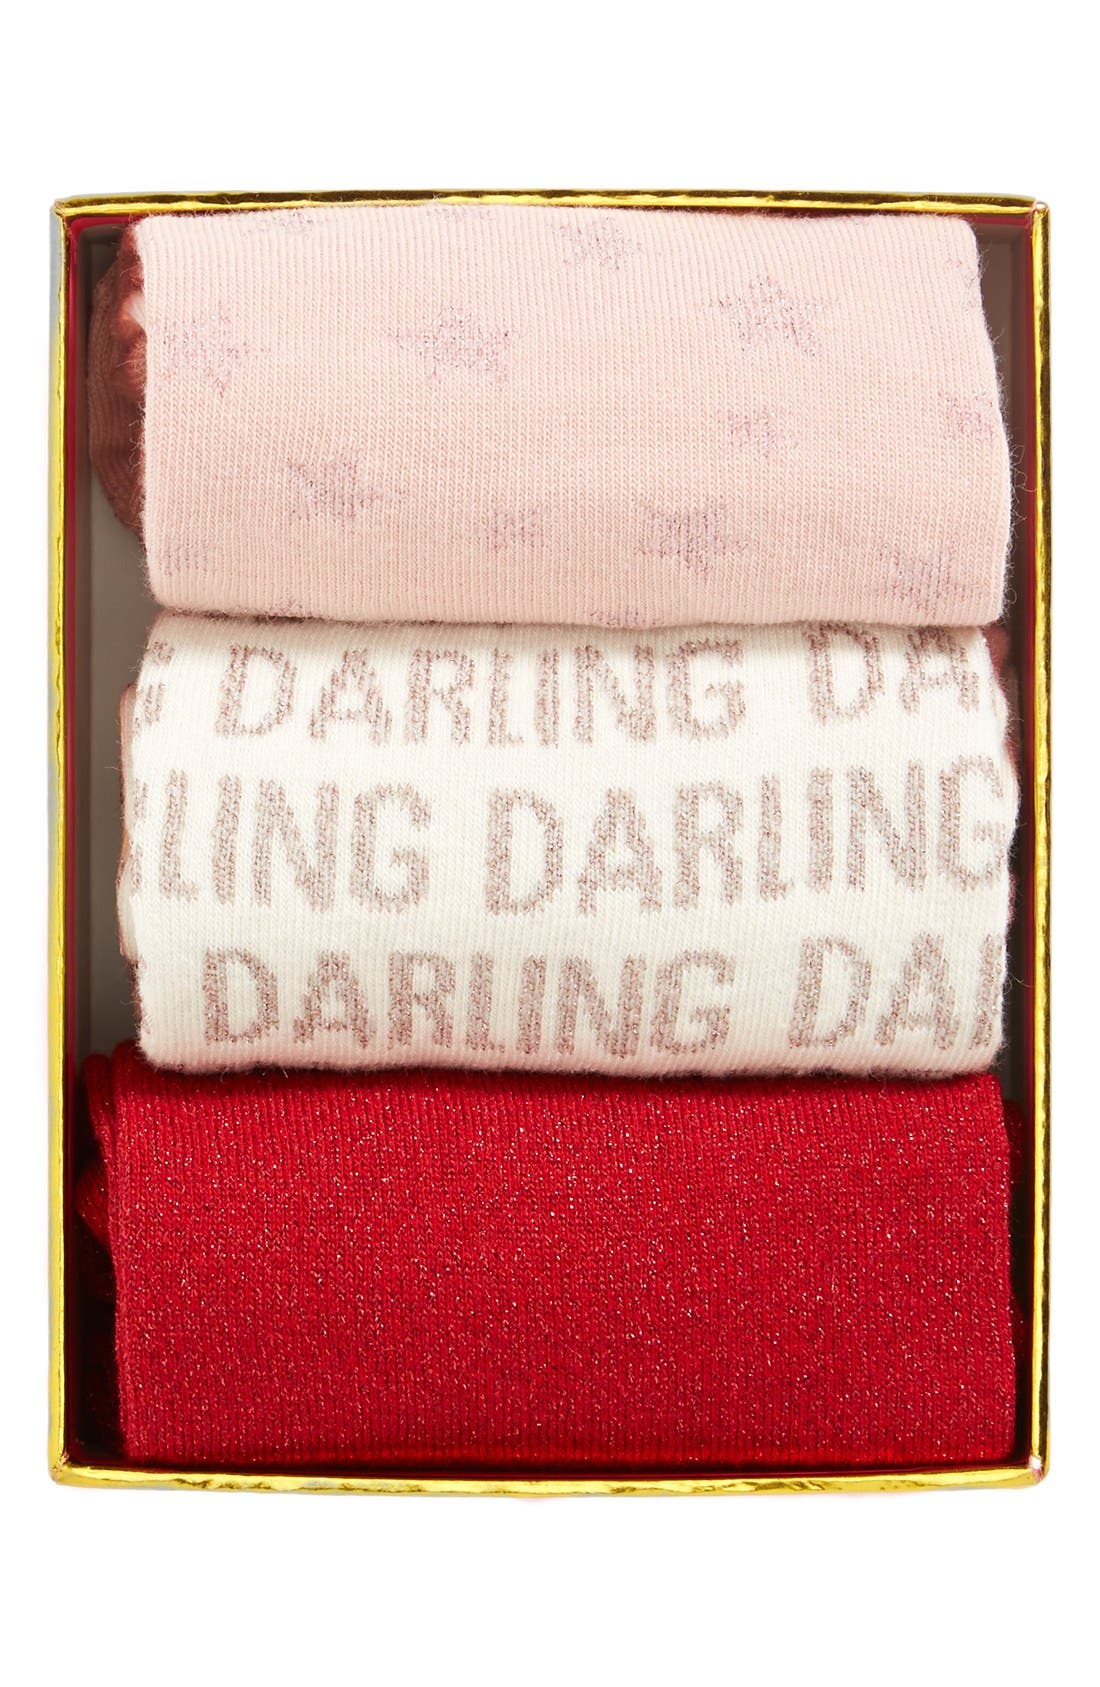 Alternate Image 1 Selected - kate spade new york 'day' boxed socks (3-Pack)